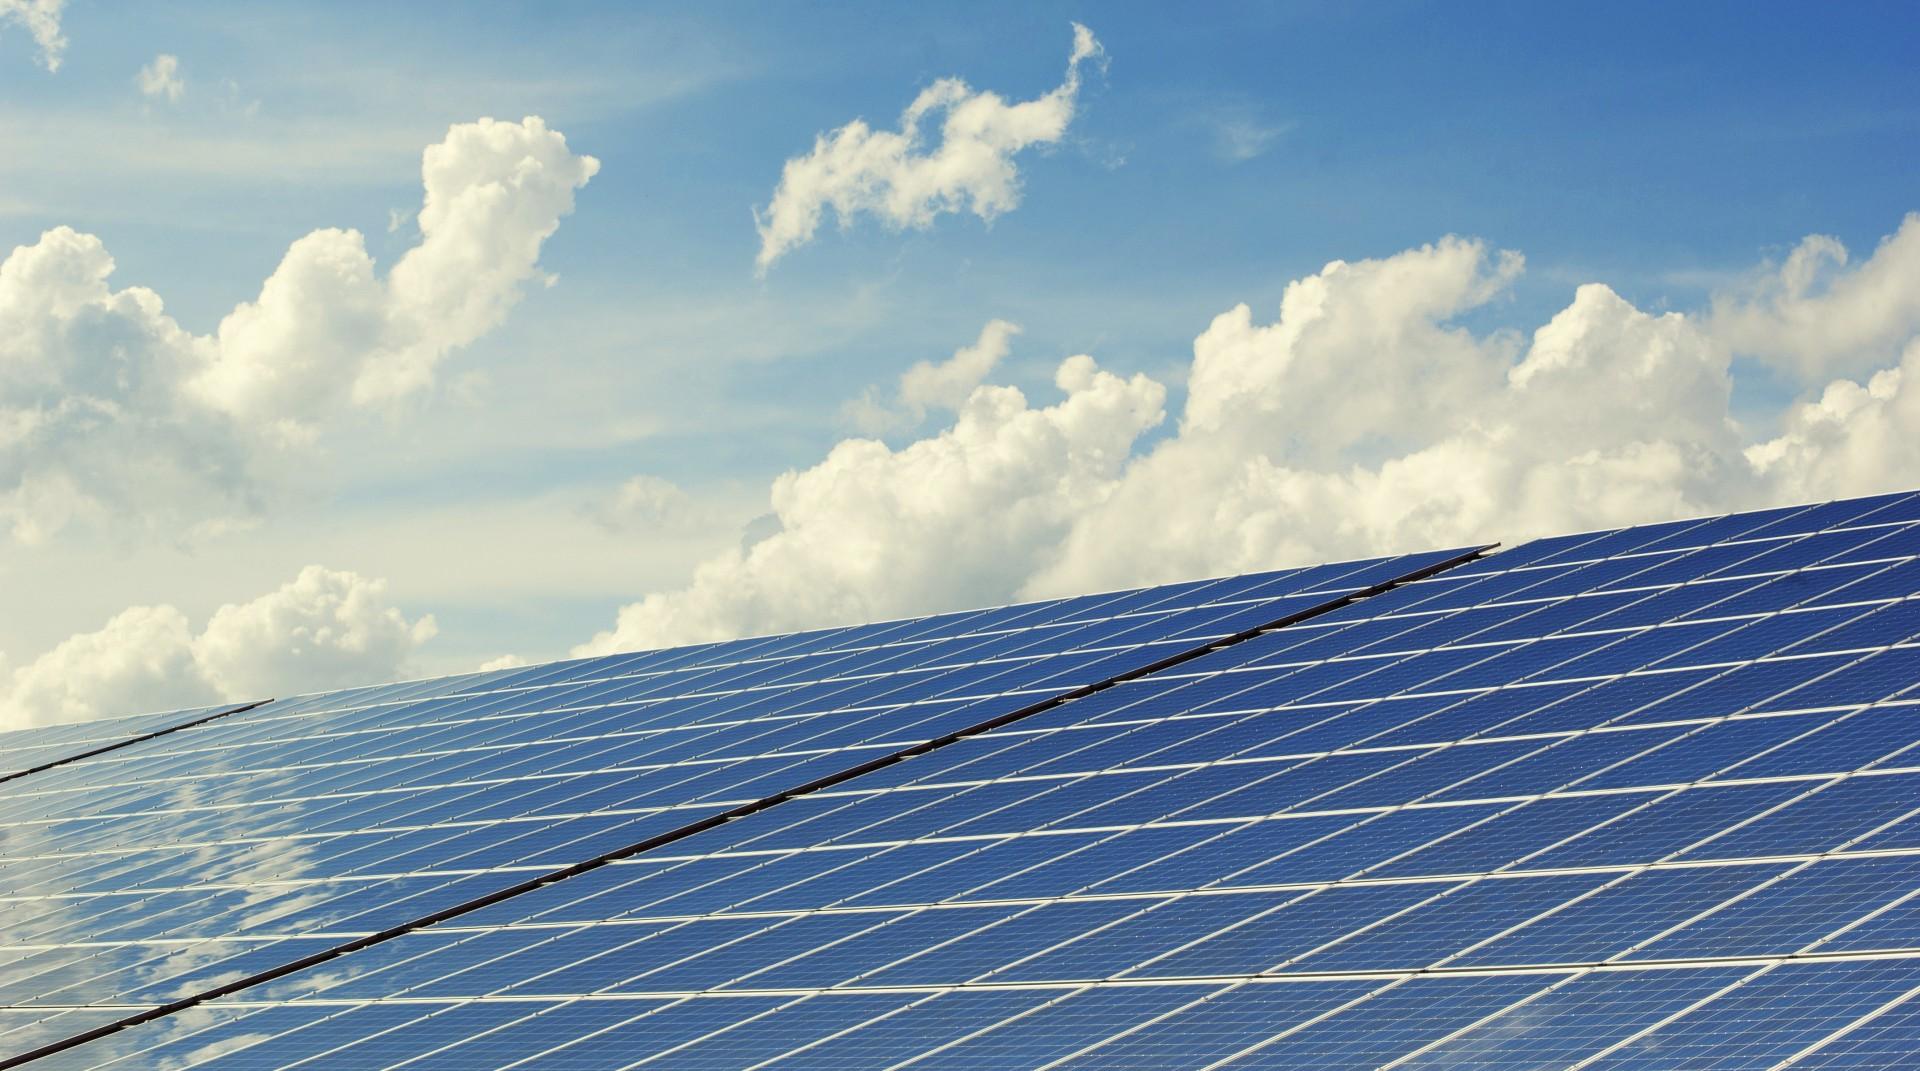 Solarenergie und Bürgerenergiegenossenschaften